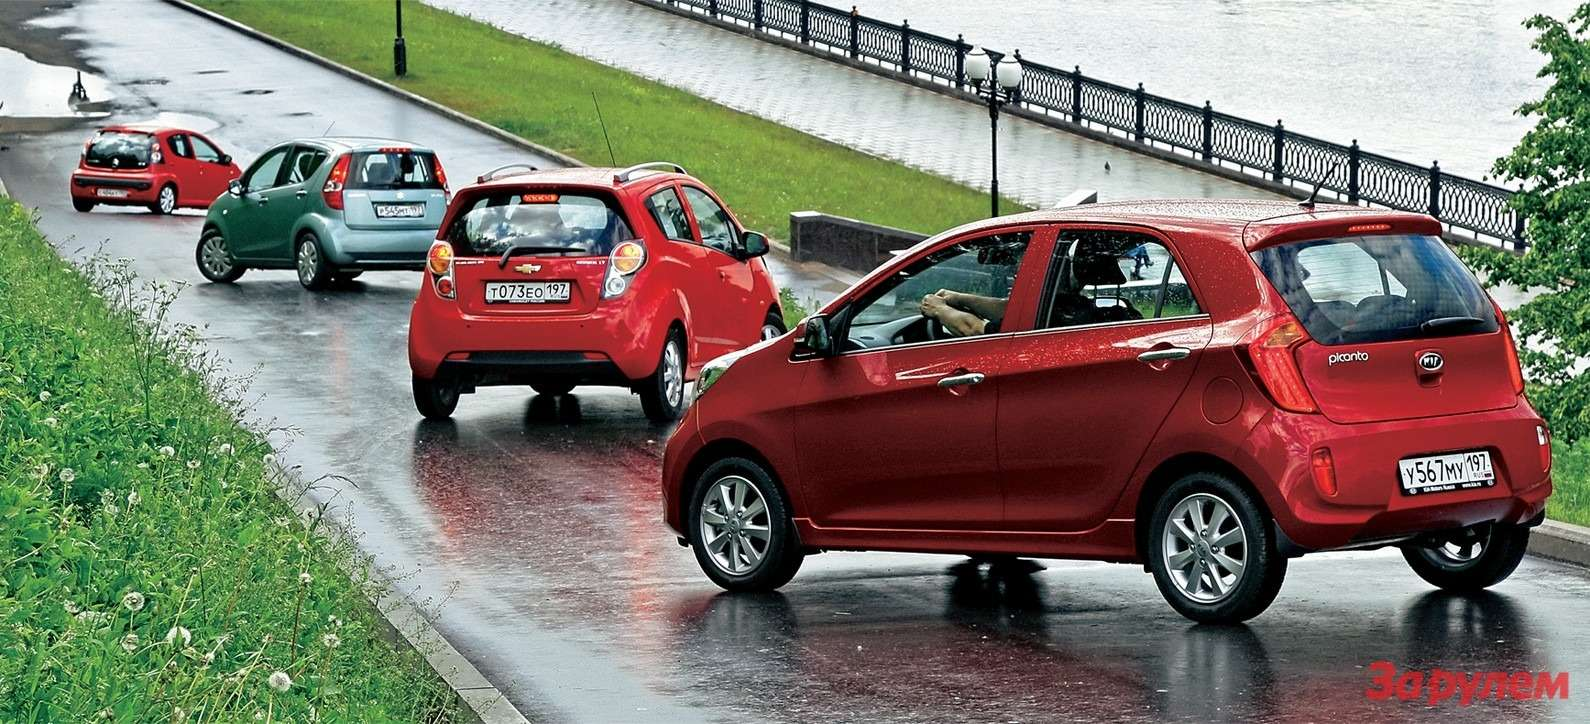 Citroen C1, Chevrolet Spark, Kia Picanto, Suzuki Splash